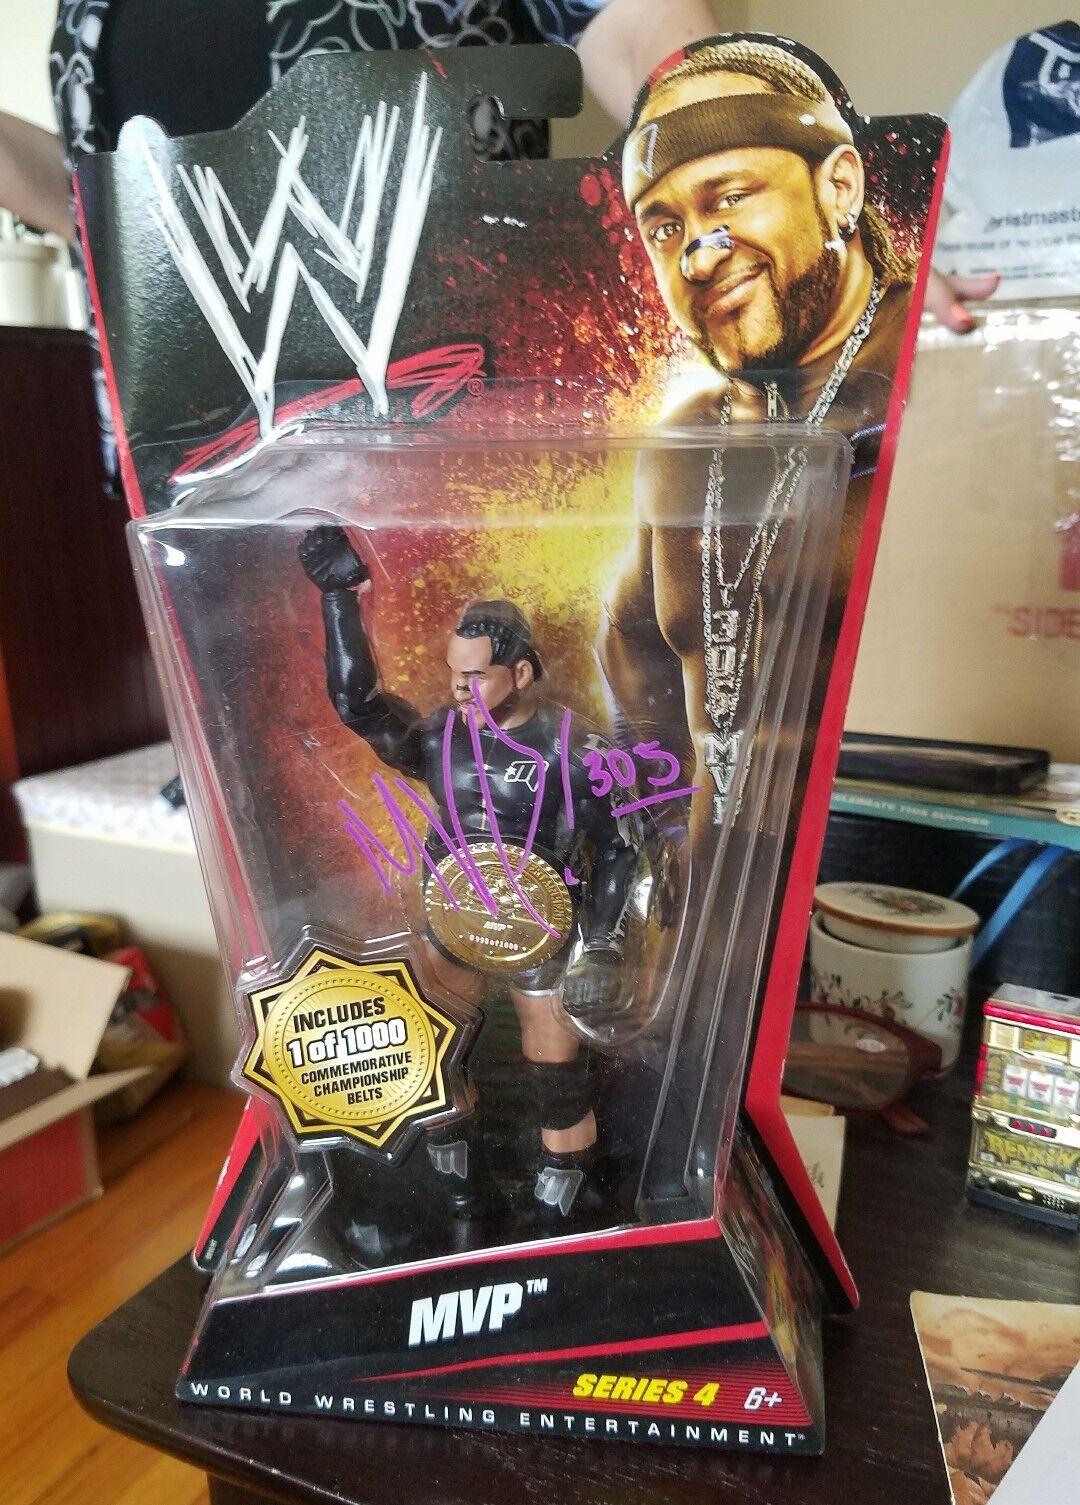 Signed Autographed New WWE Mattel MVP Series 4 Chase Belt 1 1000  48 Wrestling